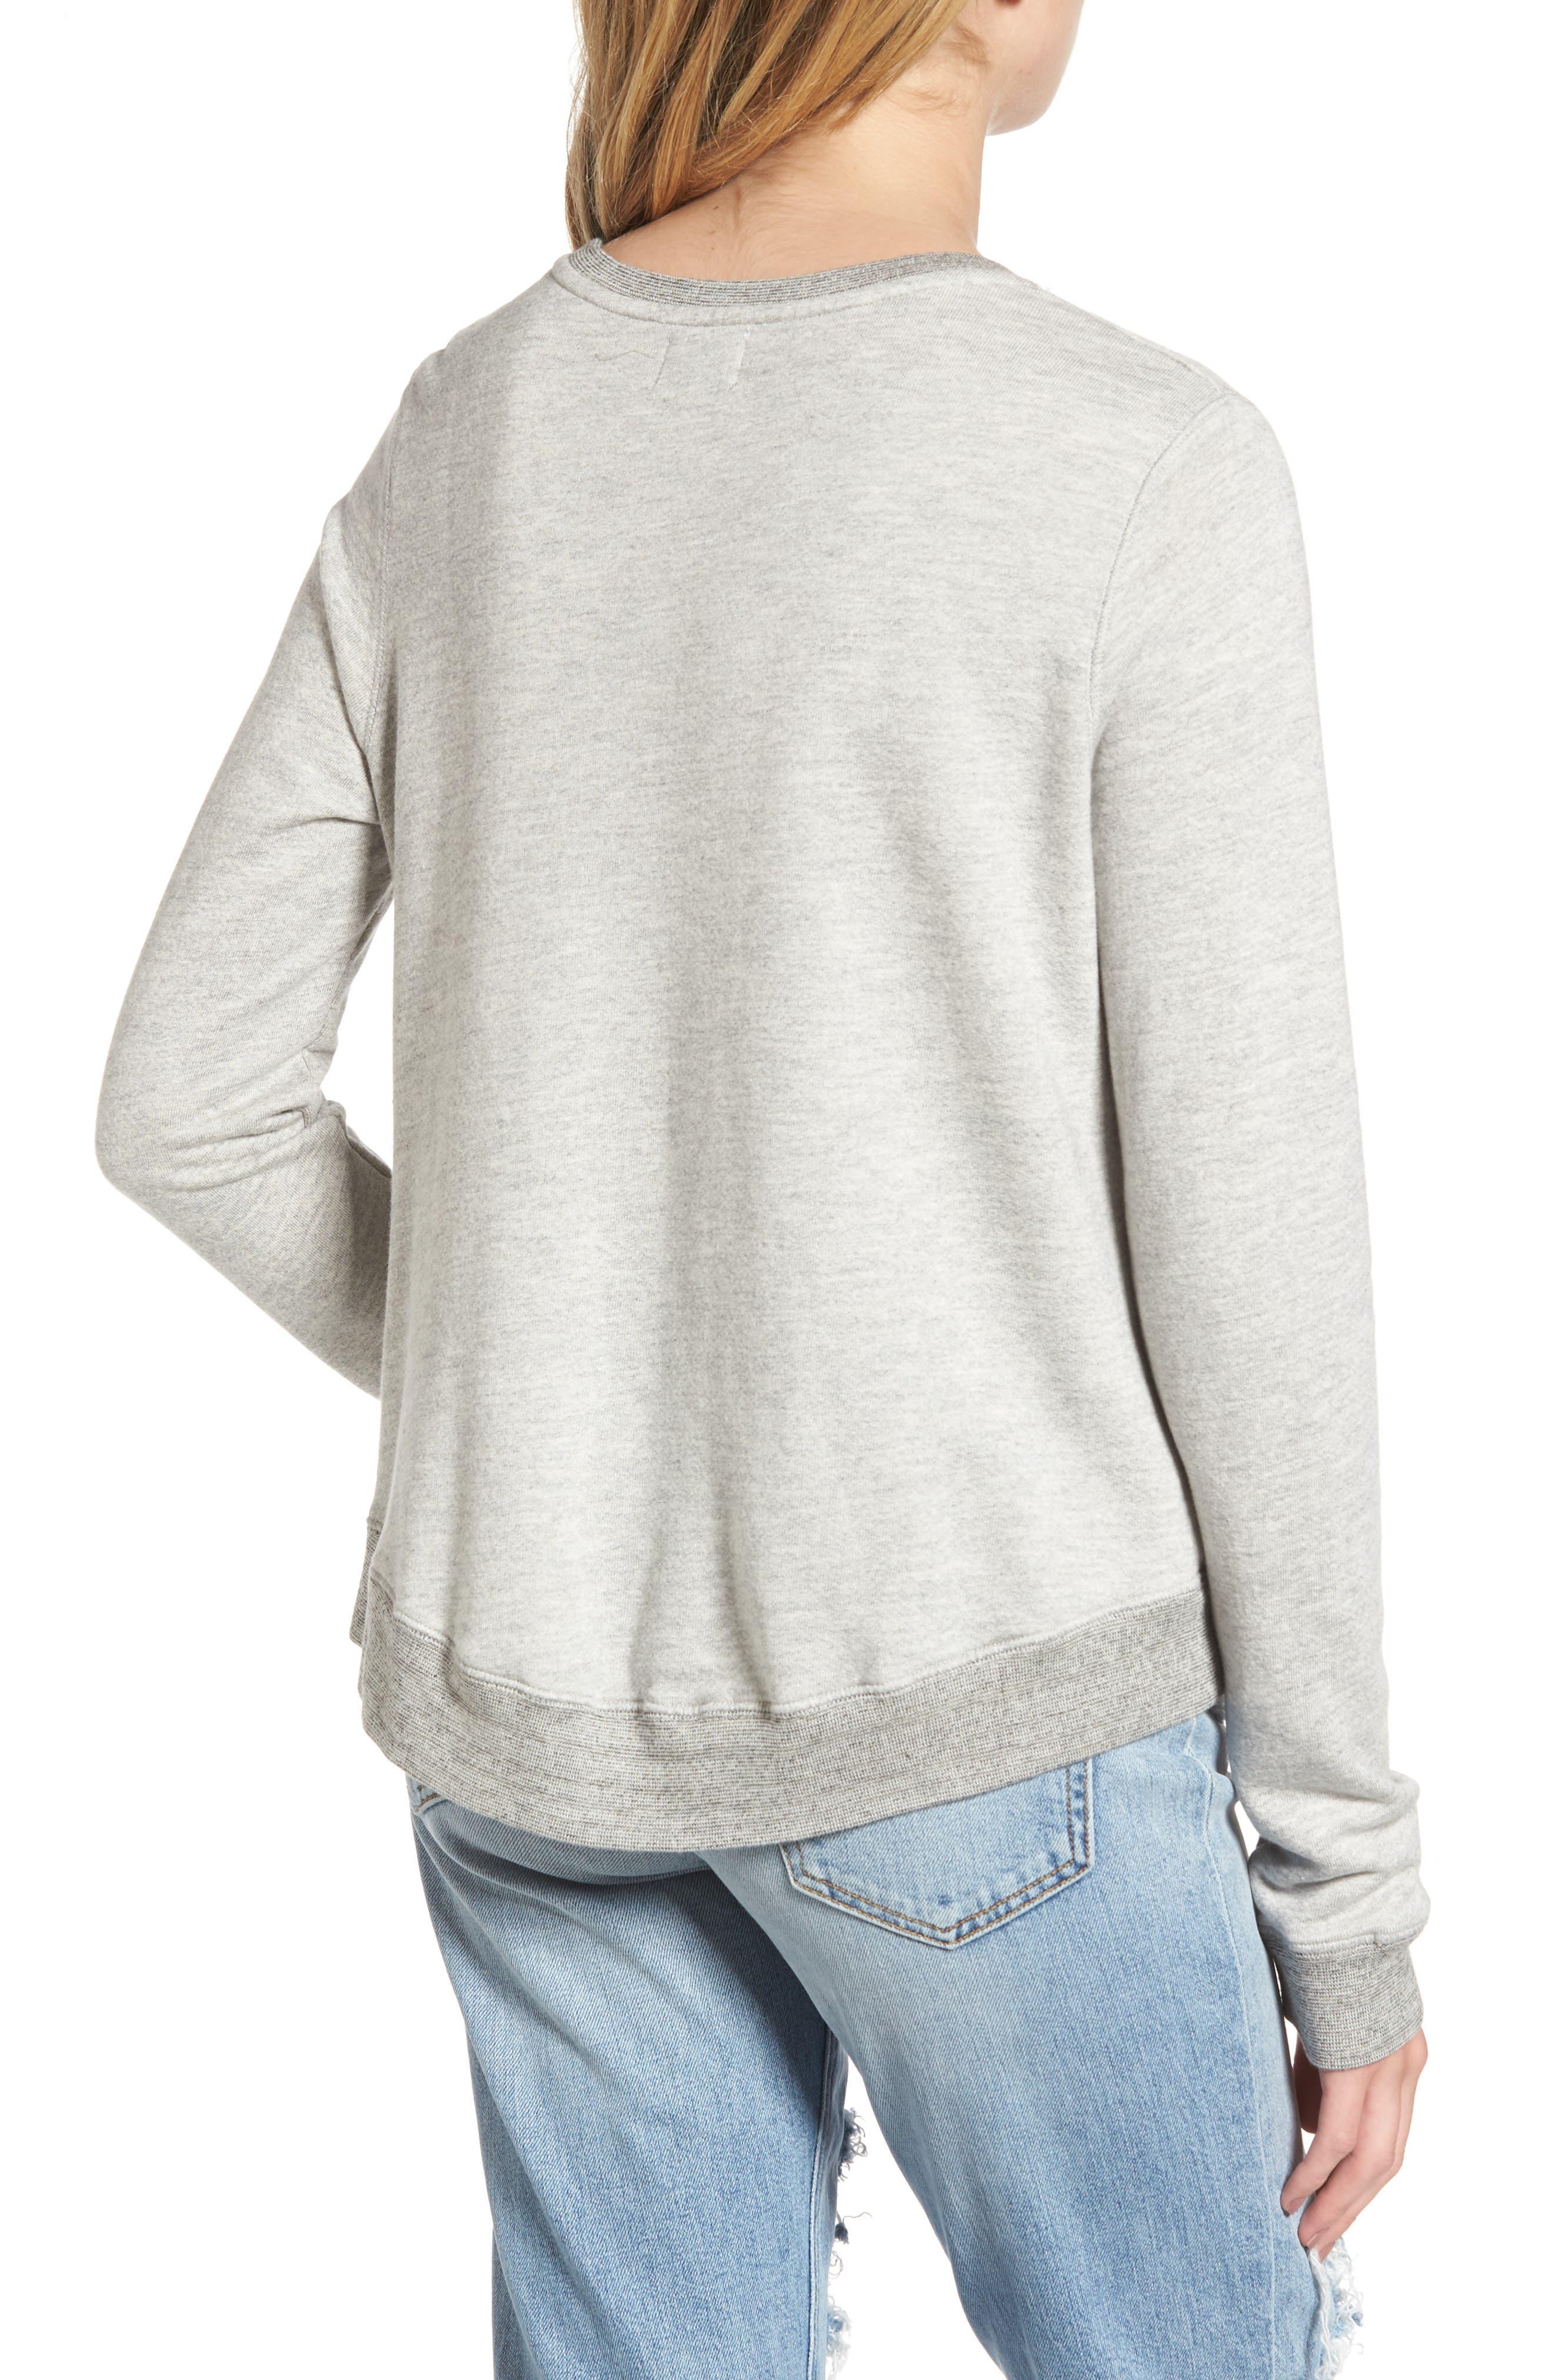 Love Sweatshirt,                             Alternate thumbnail 2, color,                             039